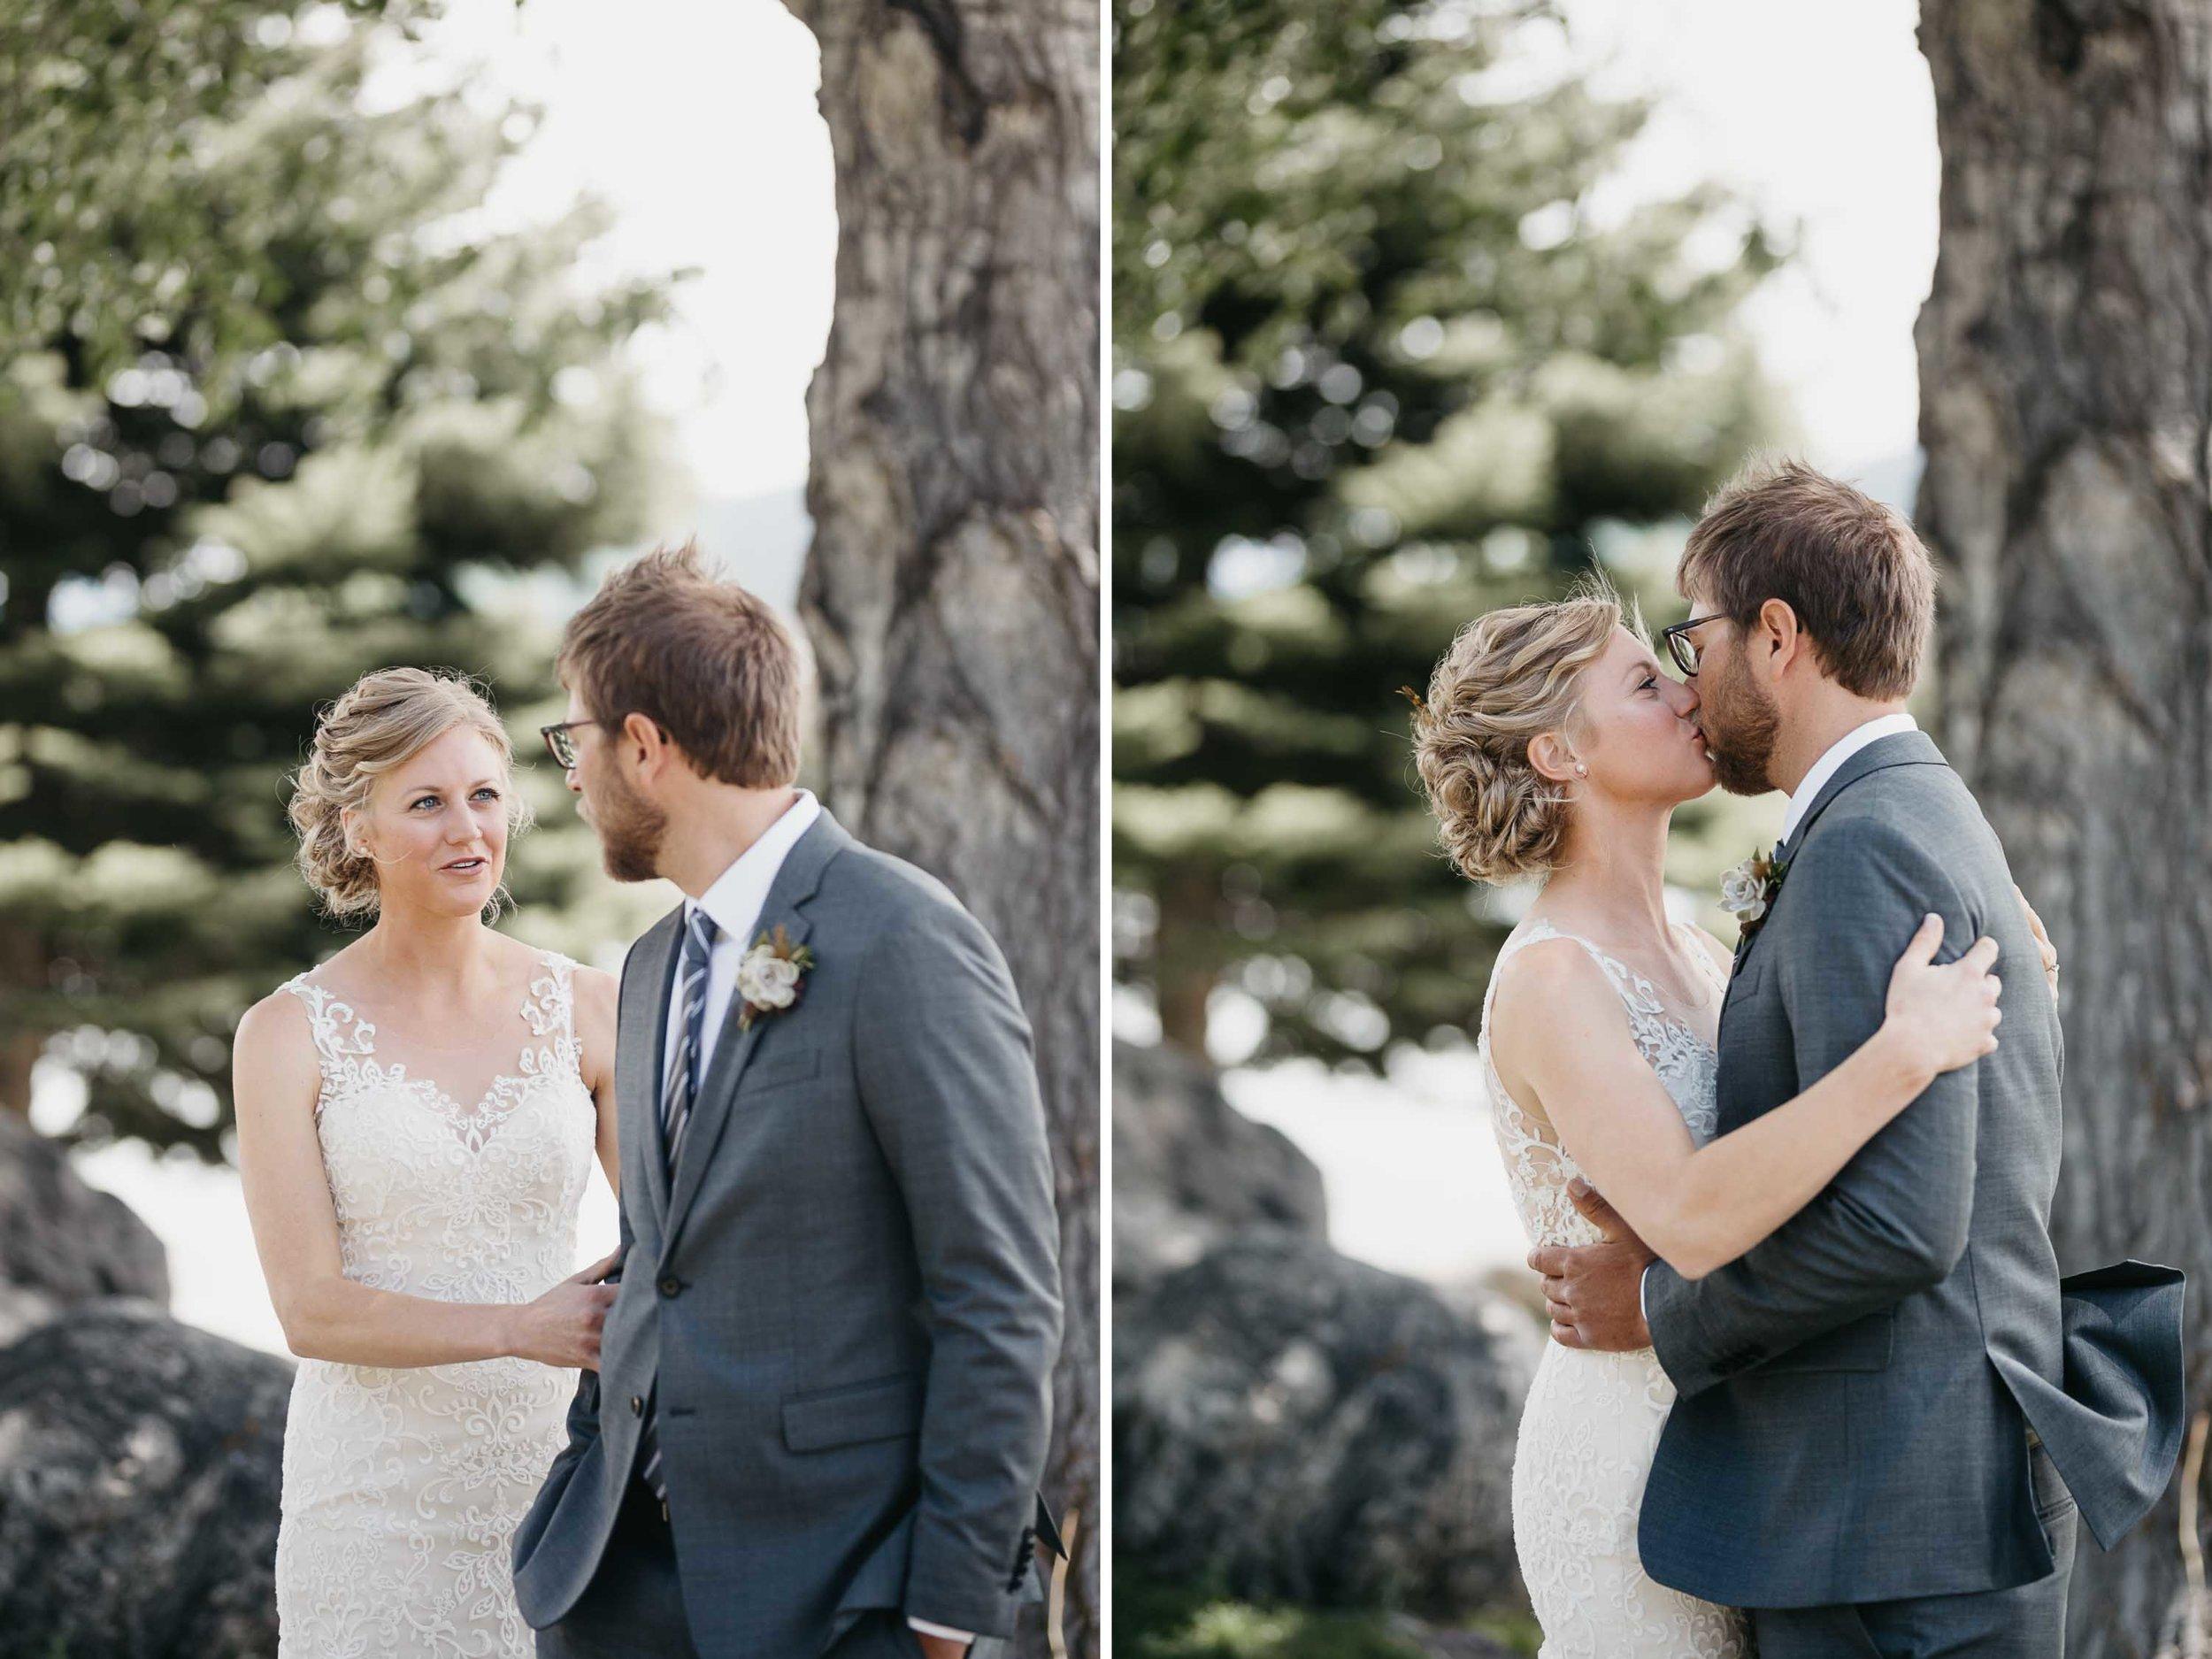 Colorado-Wedding-Photographer-19.jpg